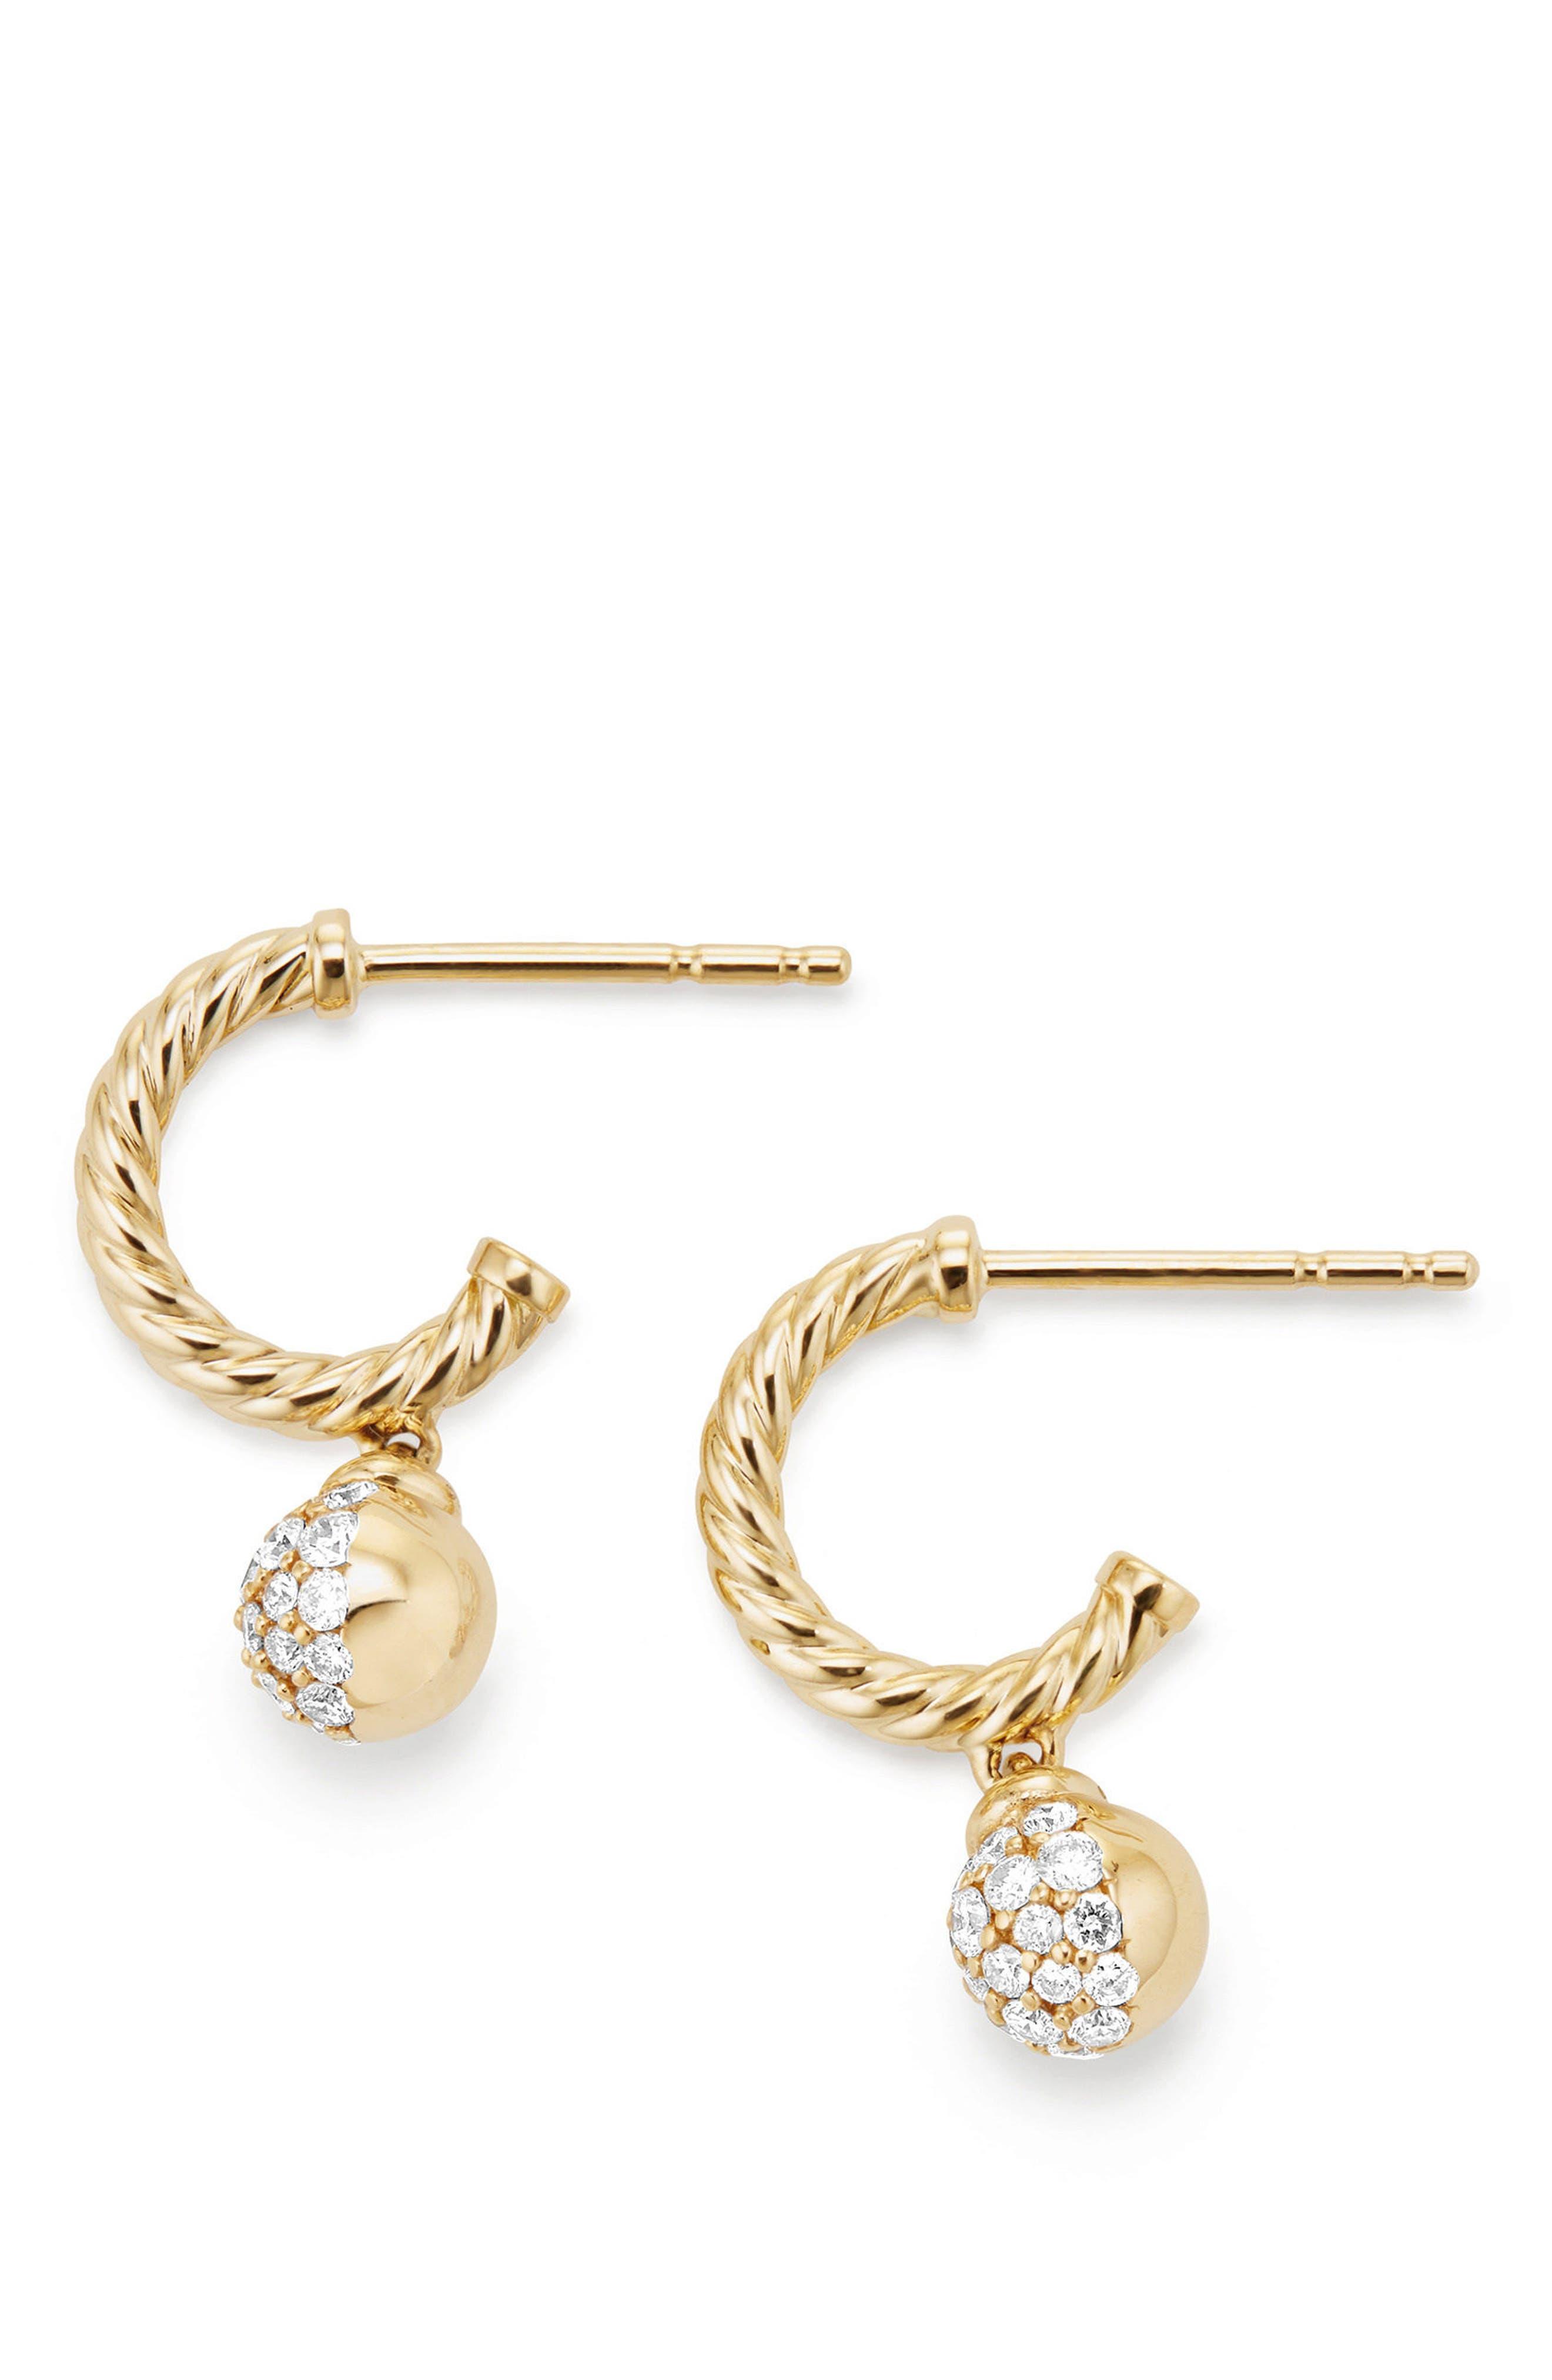 Petite Solari Hoop Pavé Earrings with Diamonds in 18K Gold,                         Main,                         color, YELLOW GOLD/ DIAMOND